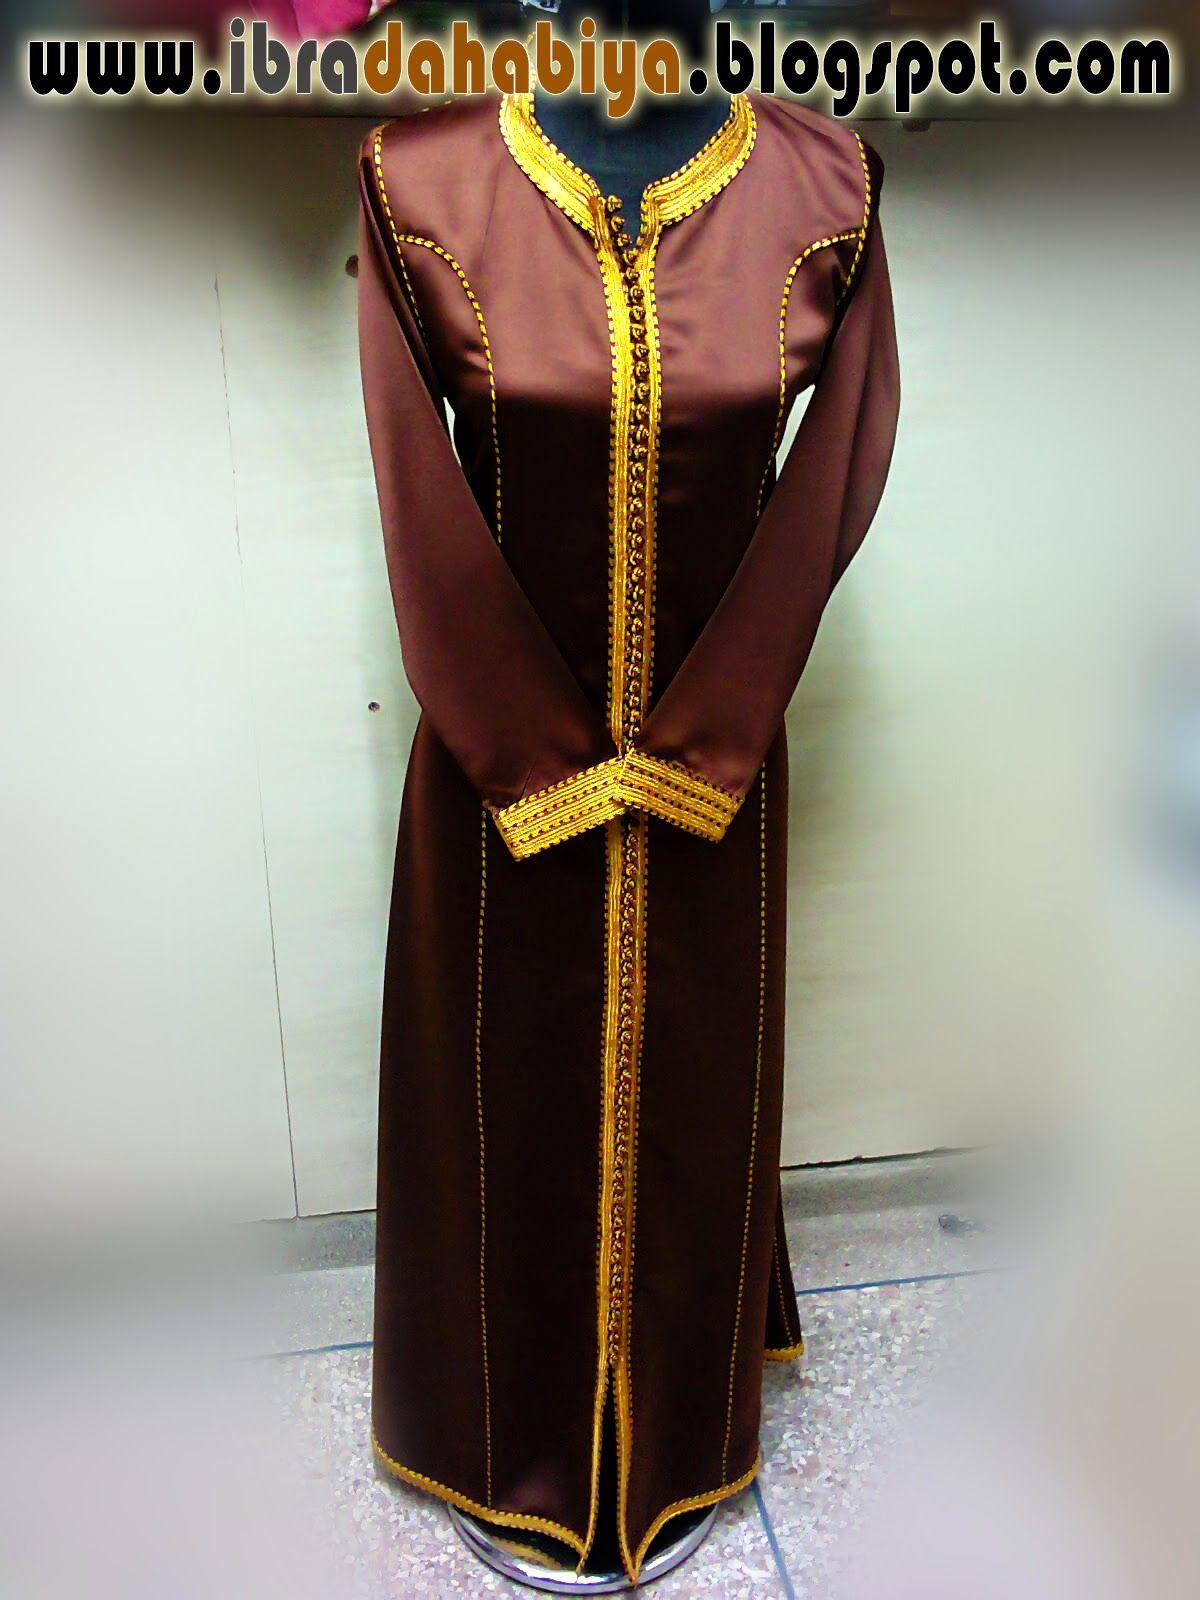 معلاق ملابس عبايات Leo